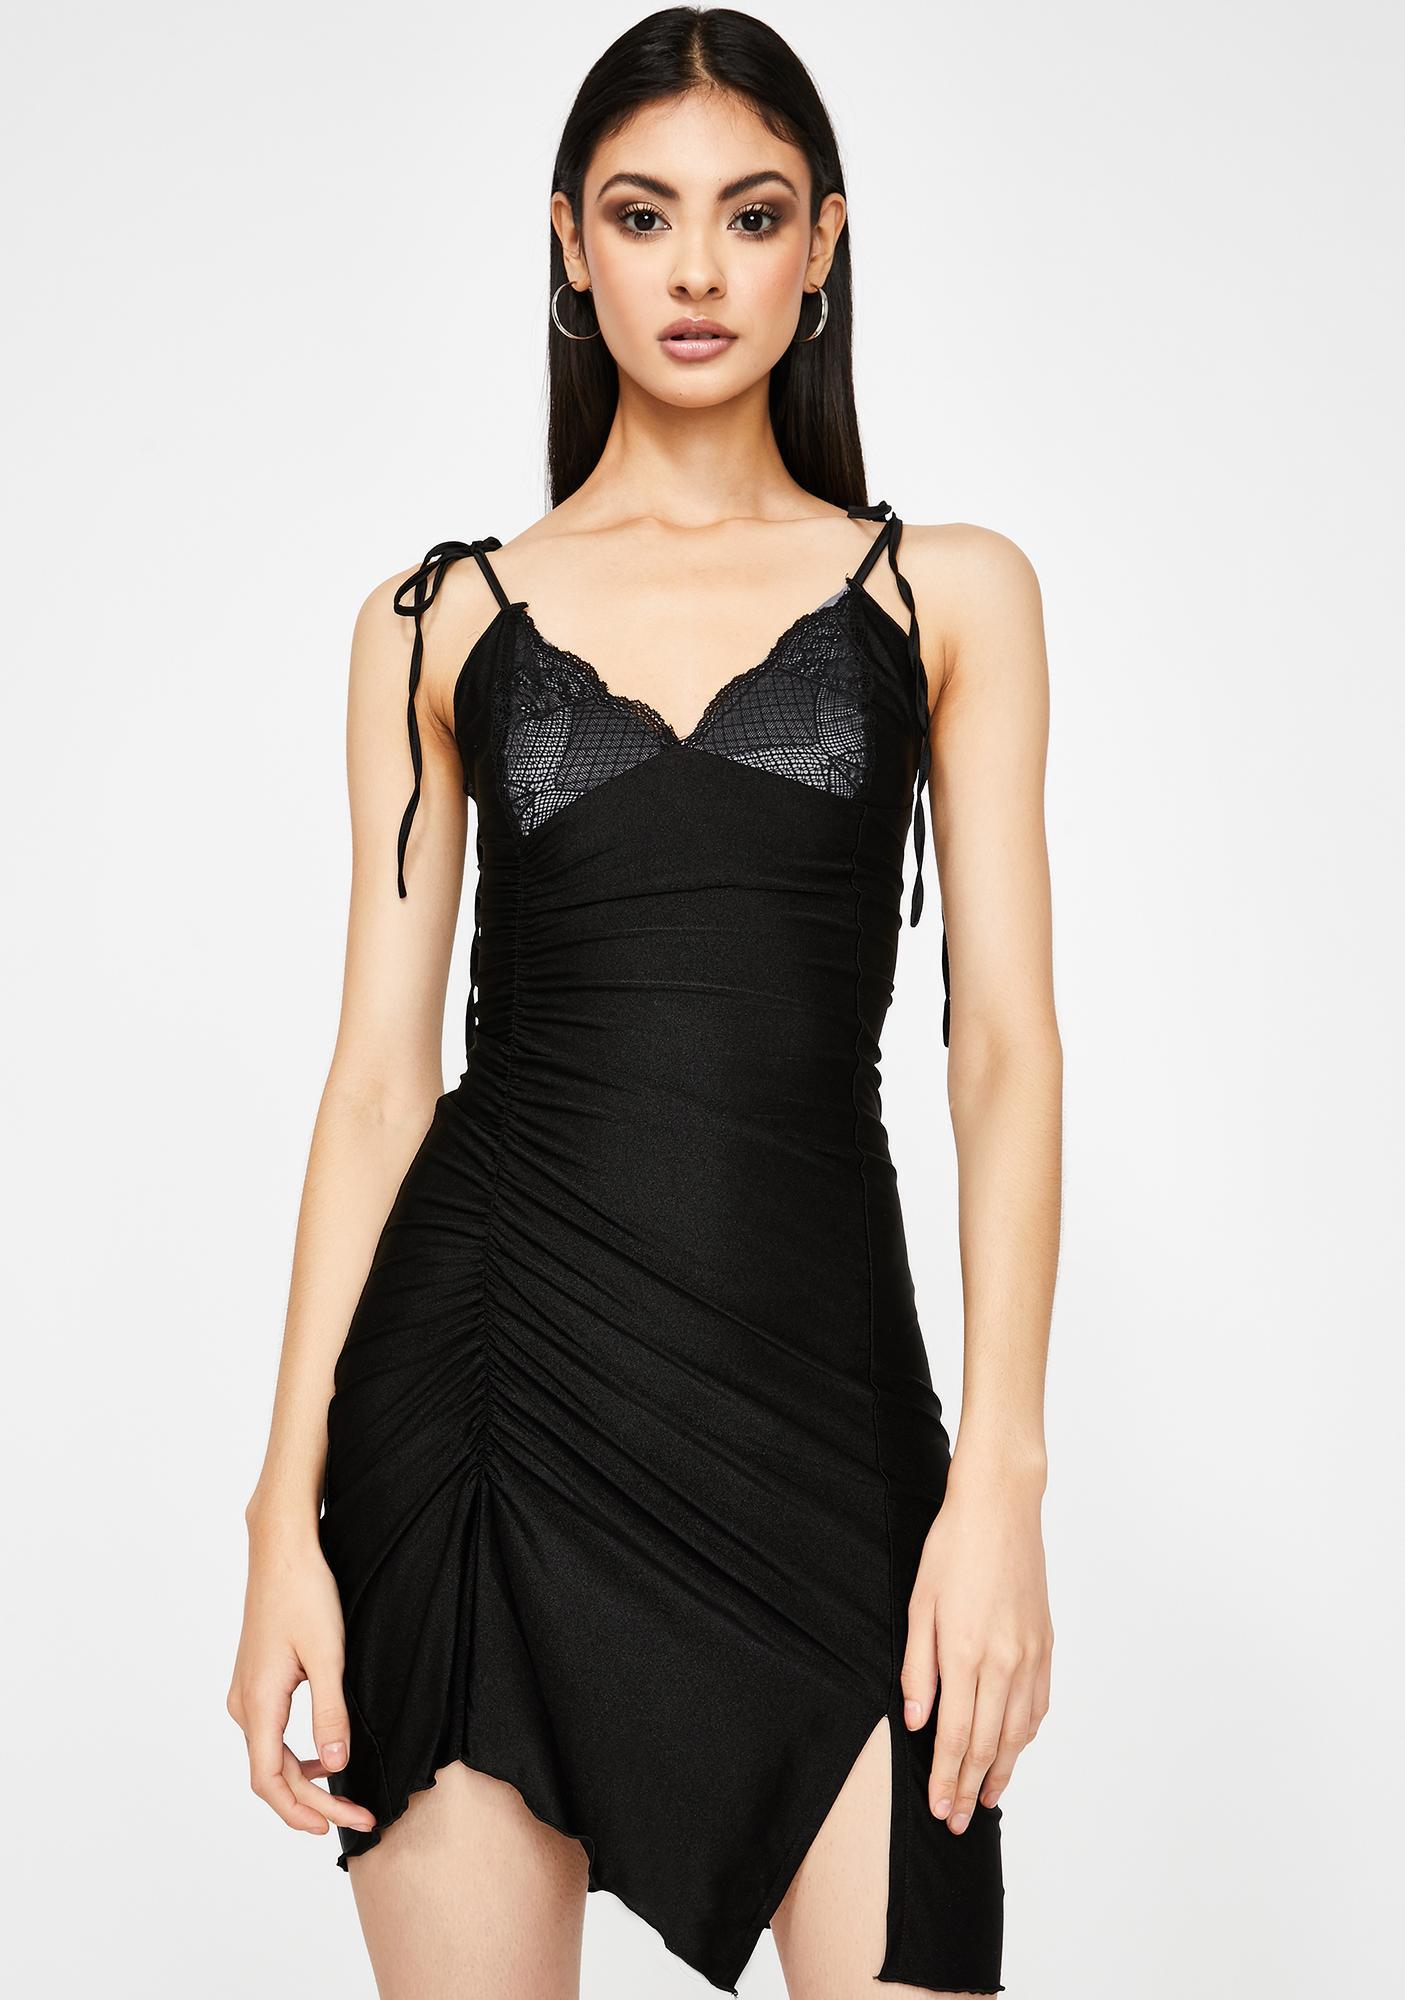 GANGYOUNG Black Spider Dress